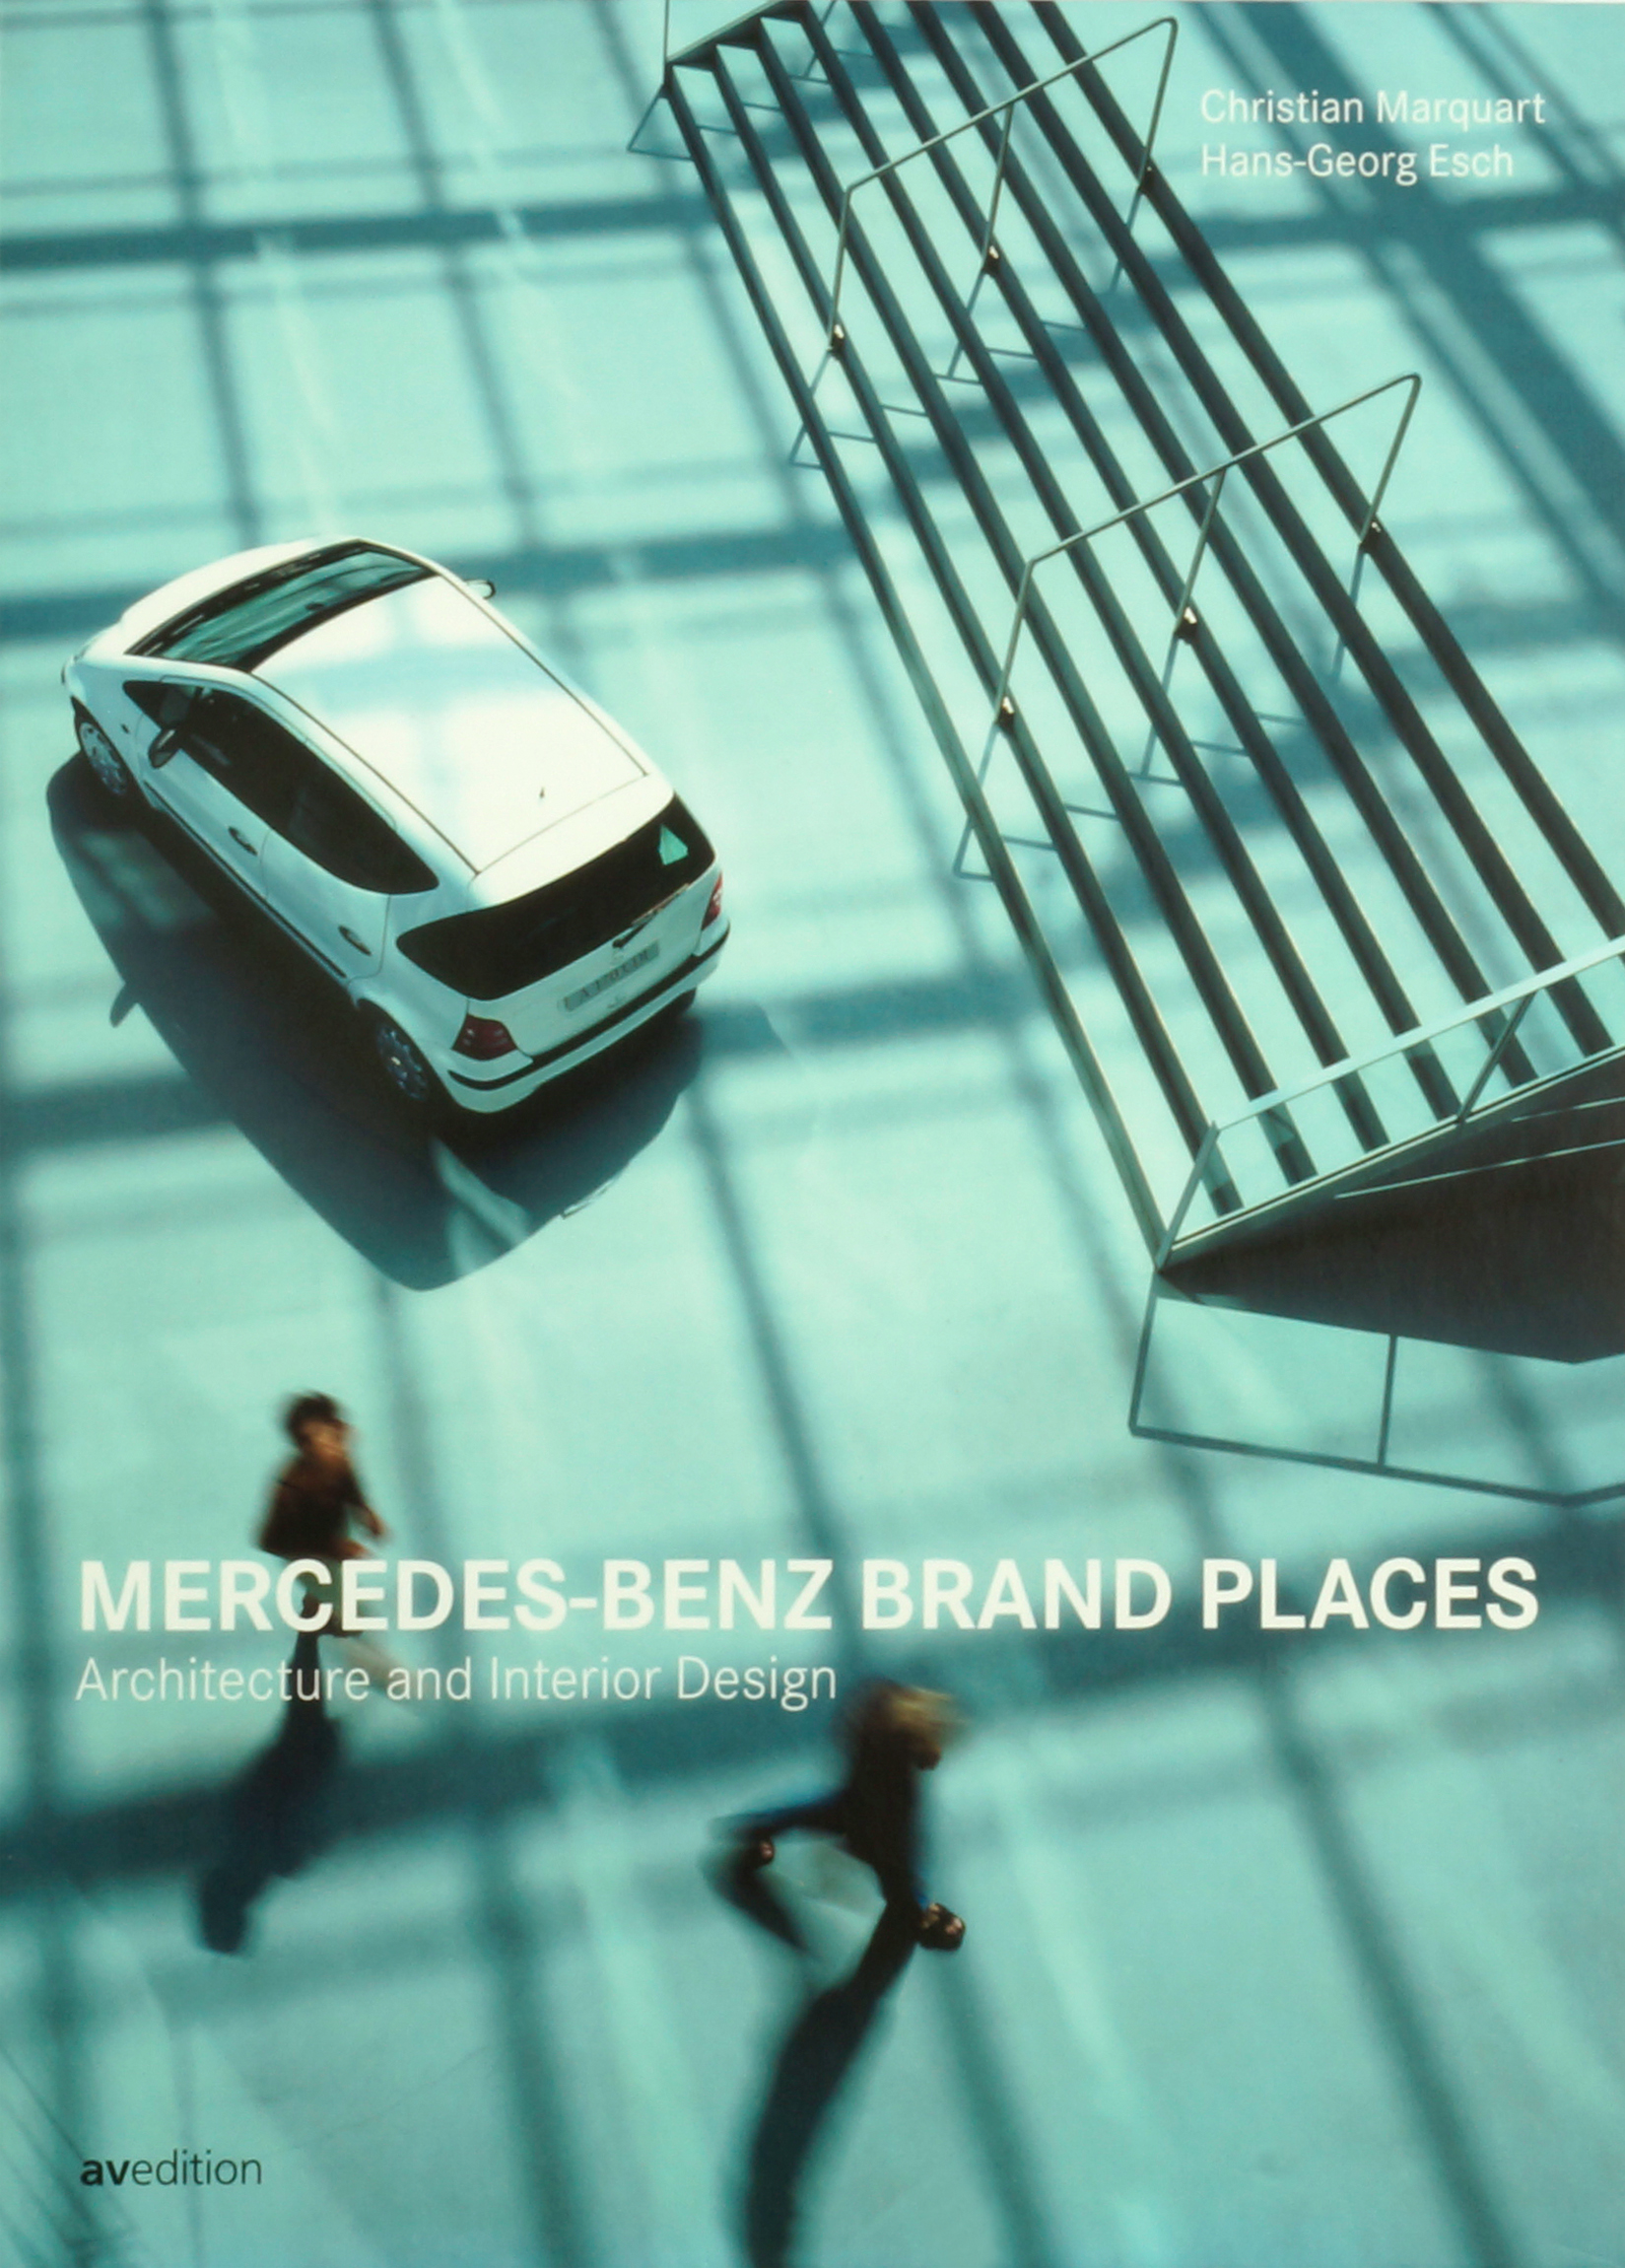 Mercedes-Benz Brand Places